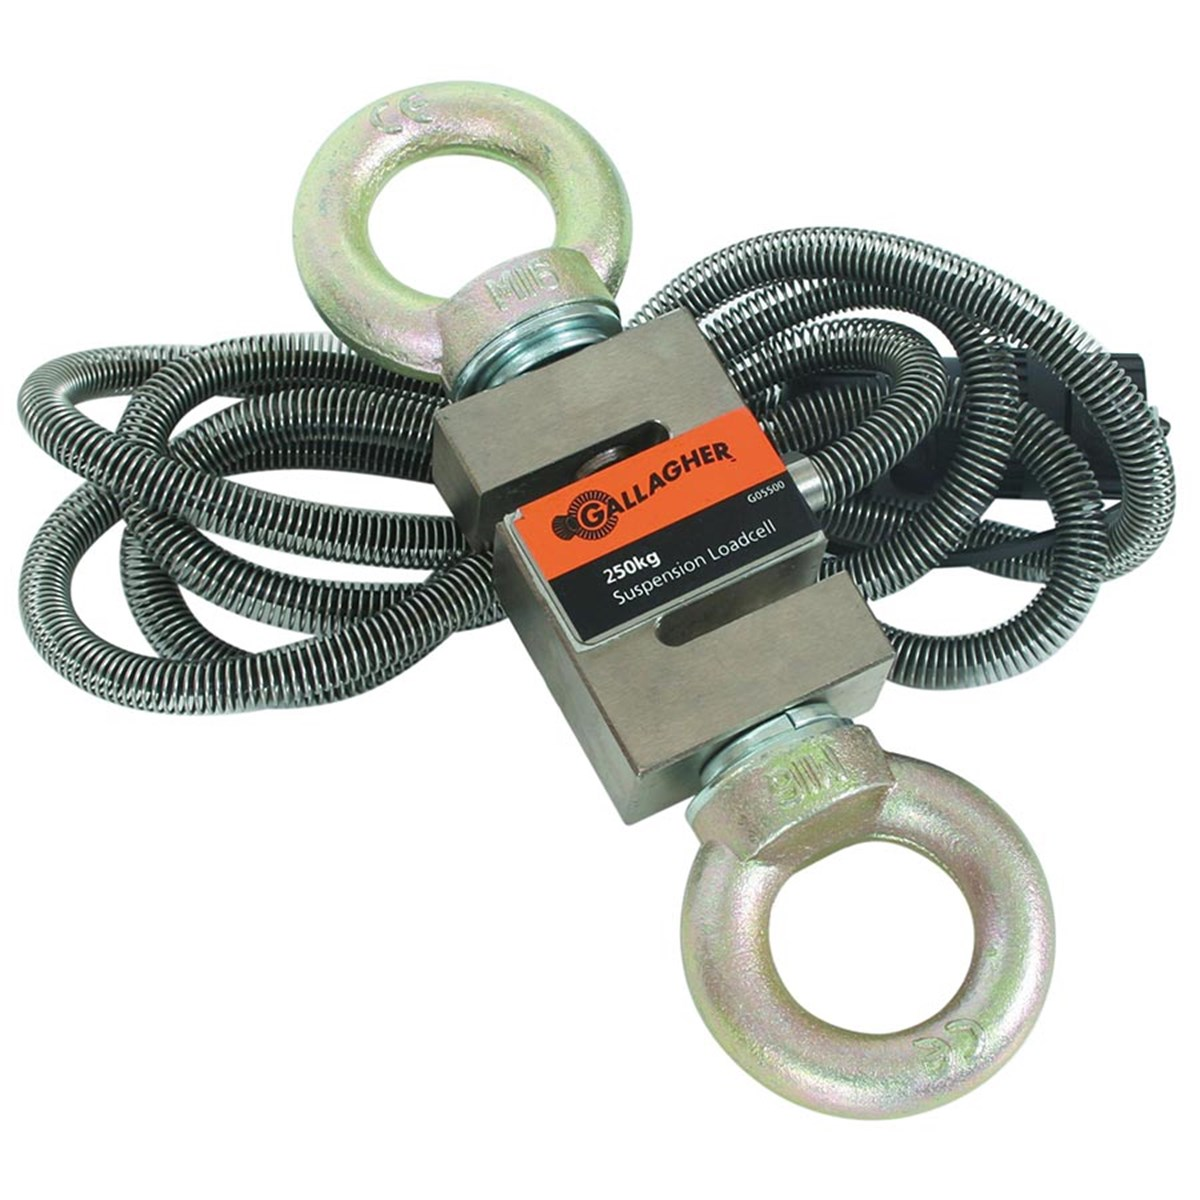 Aps loadcell 250 kg suspension